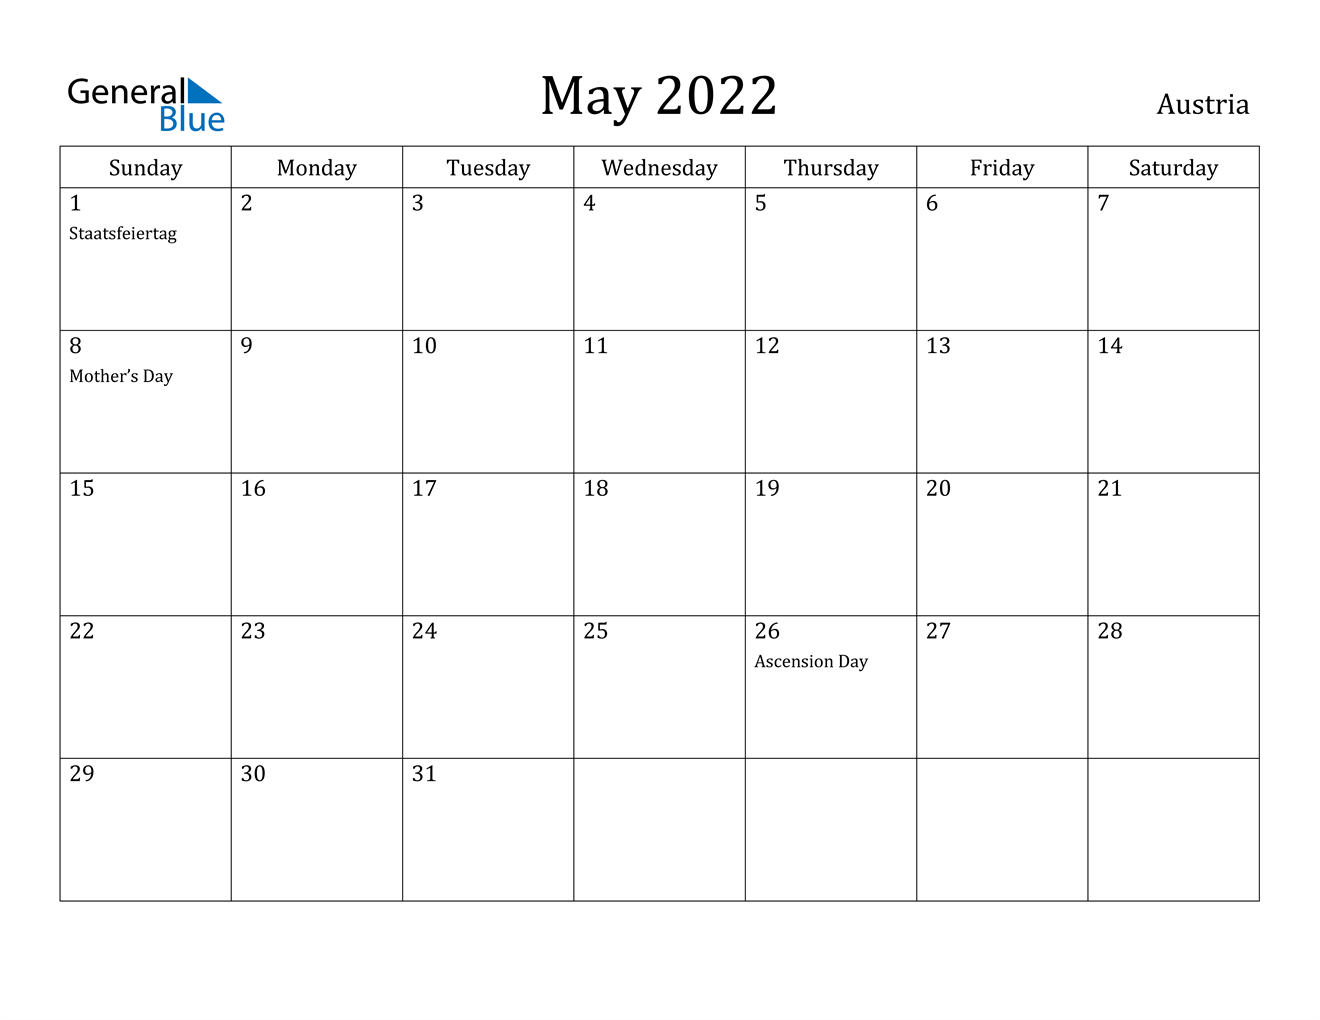 May 2022 Calendar - Austria within Calendar March April May June 2022